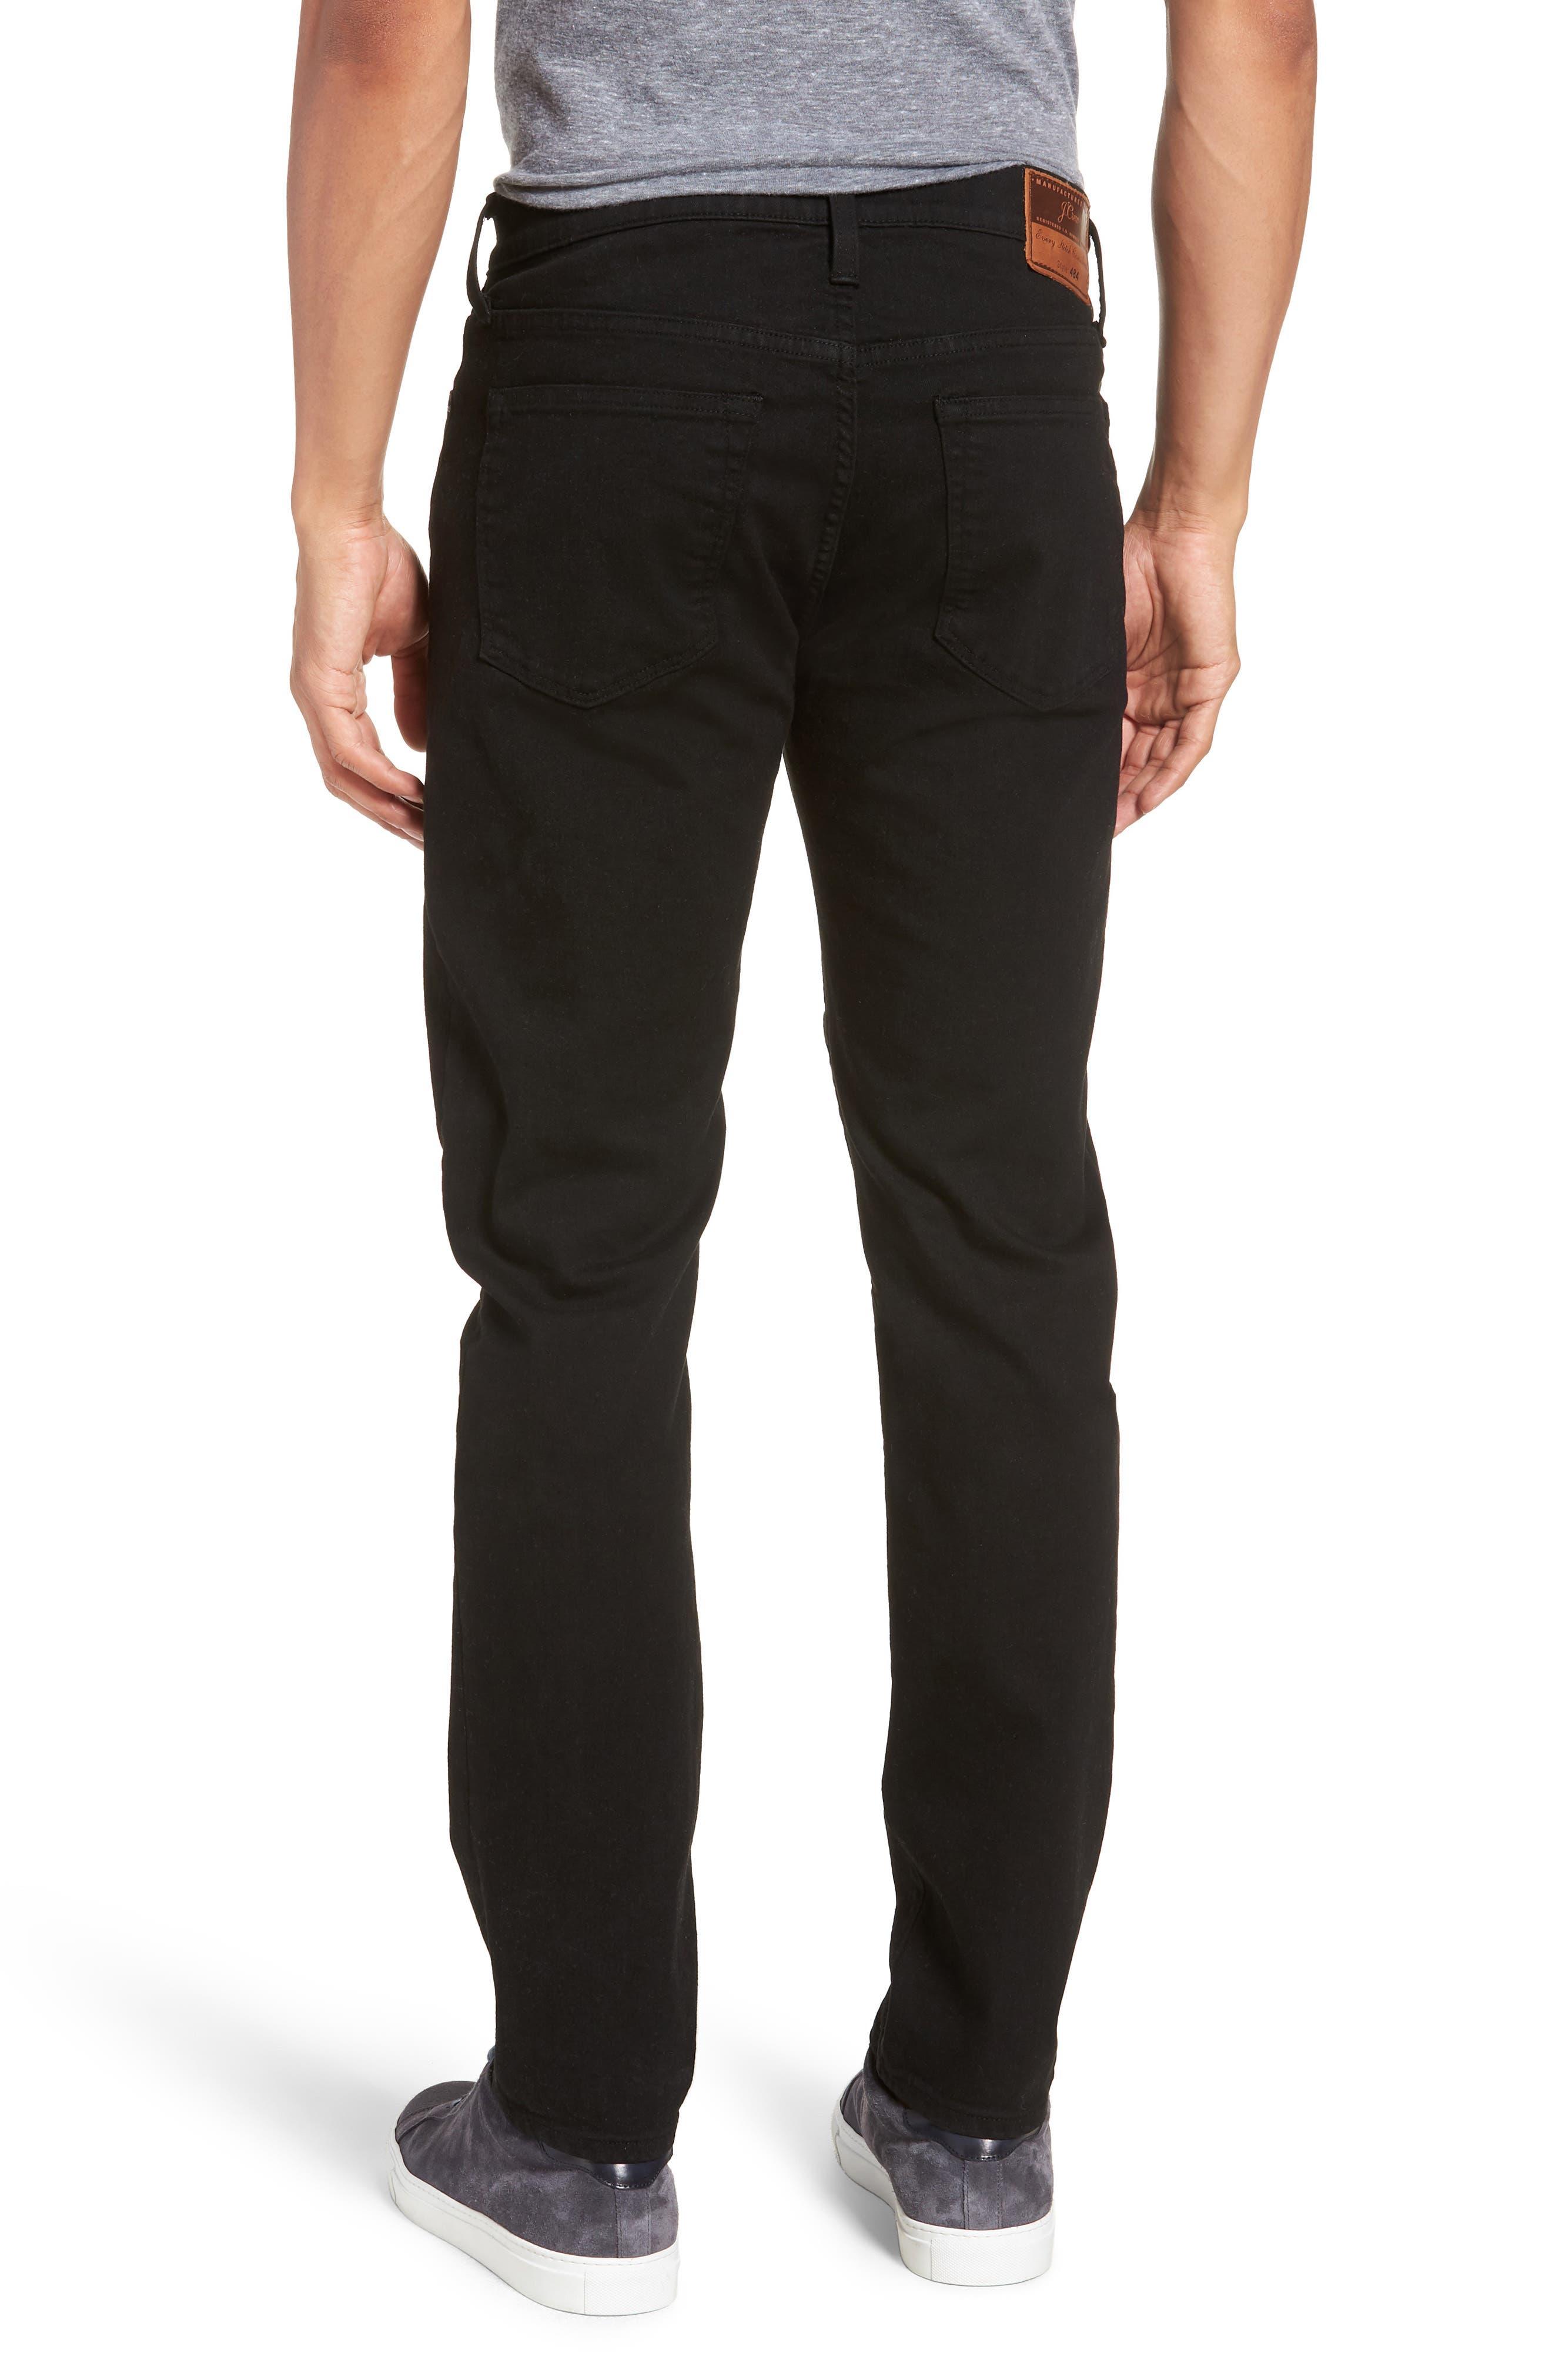 484 Slim Fit Stretch Jeans,                             Alternate thumbnail 2, color,                             009